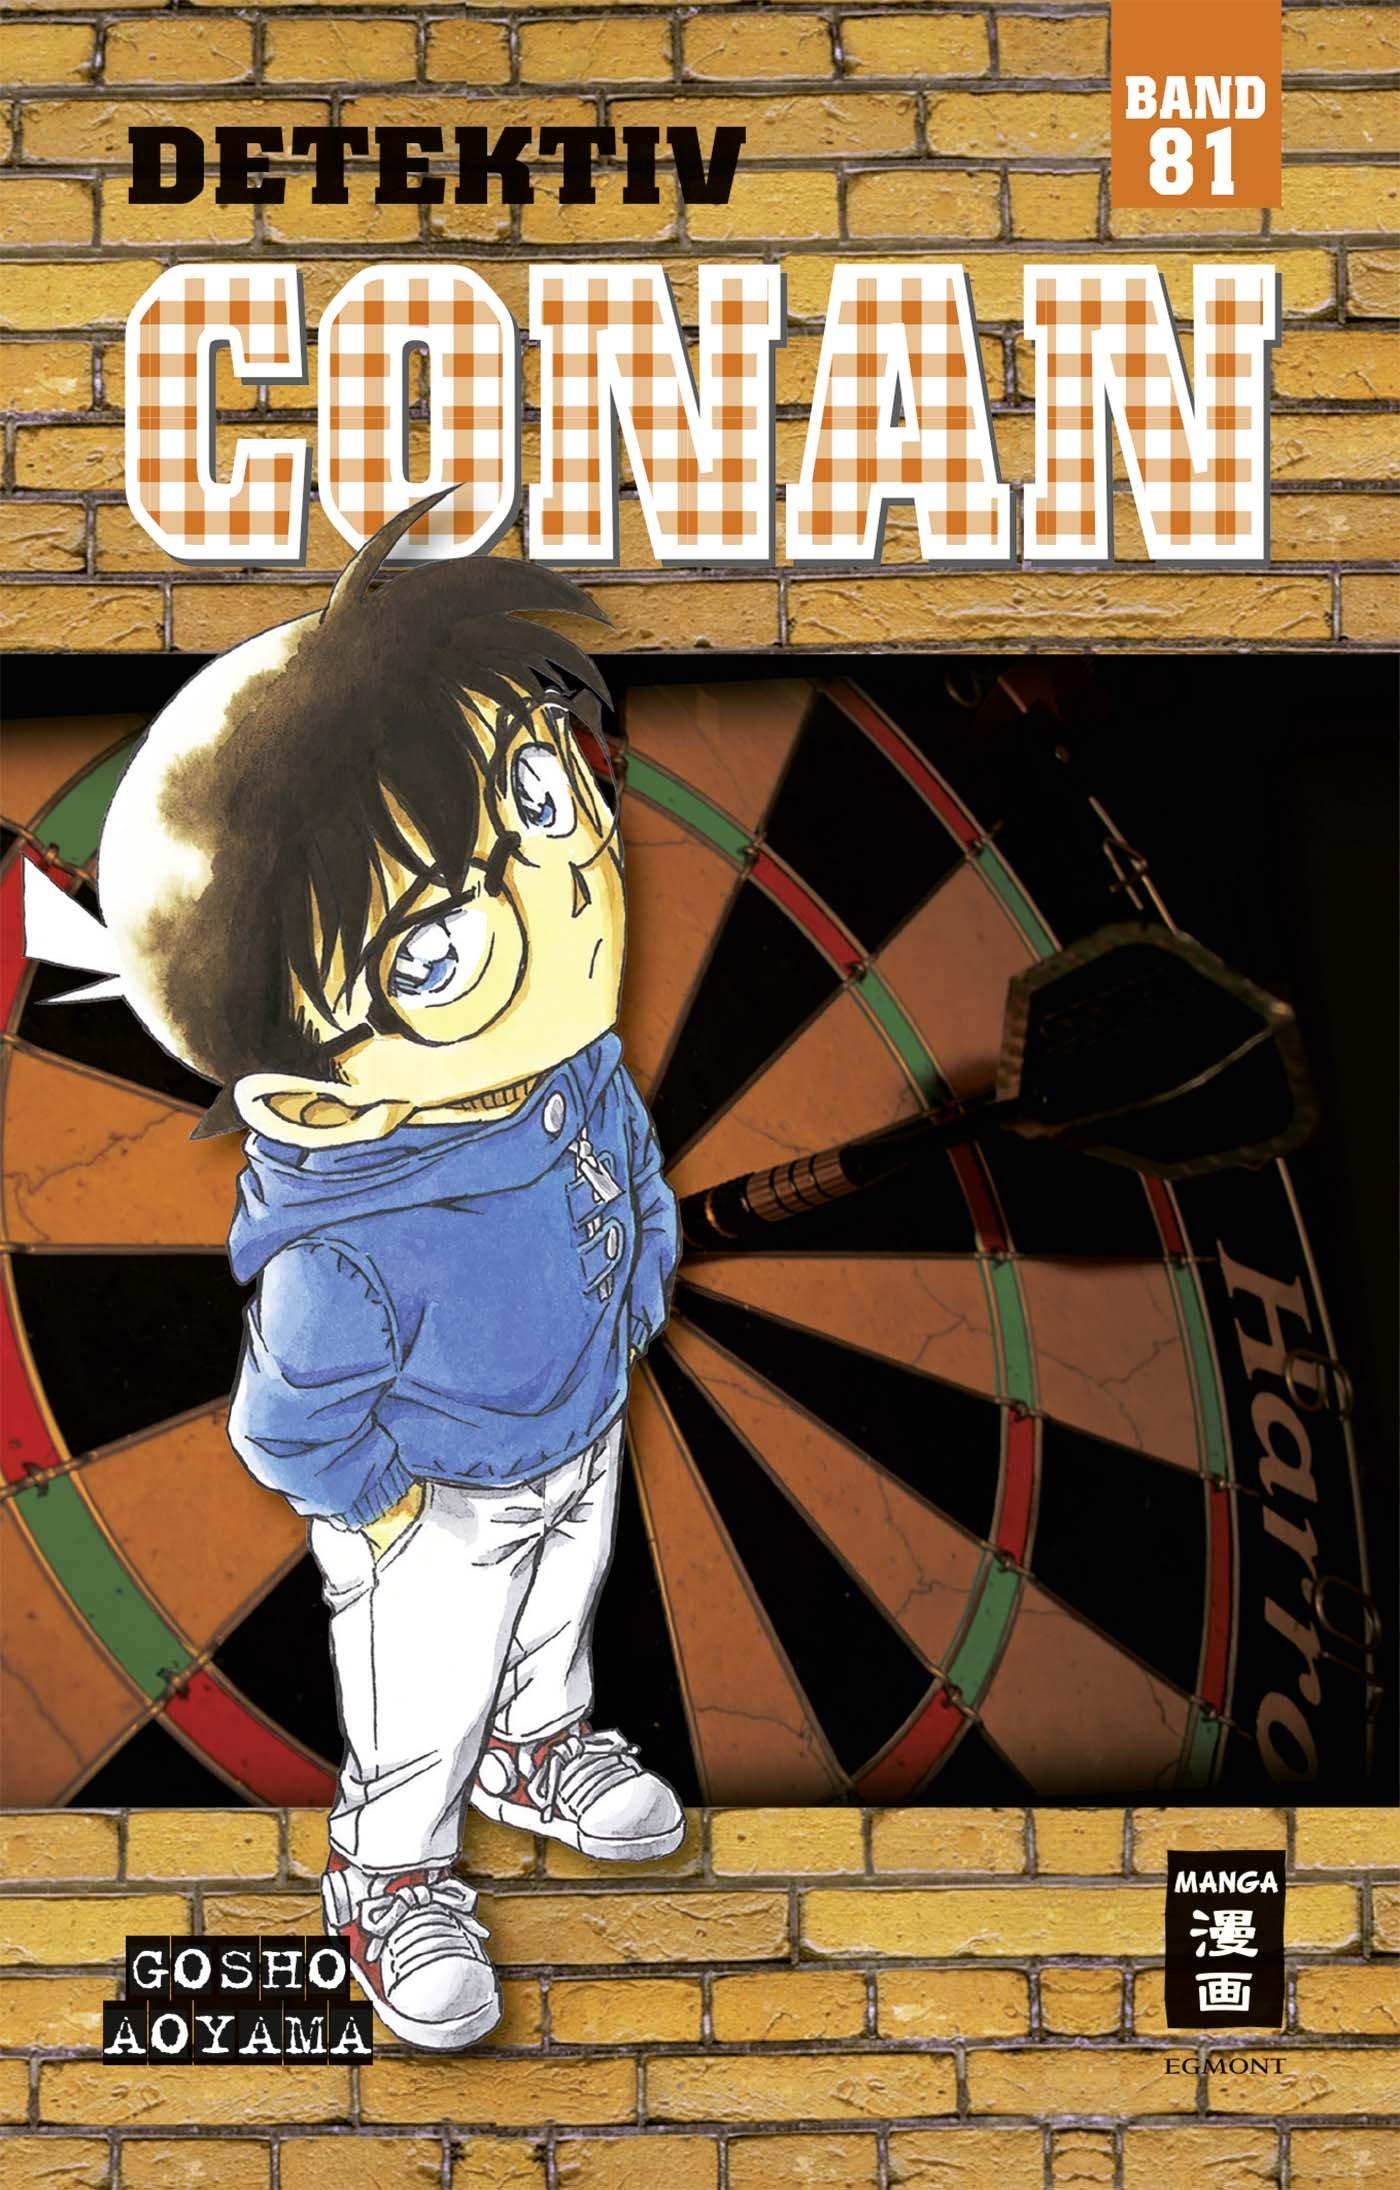 Detektiv Conan, Band 81